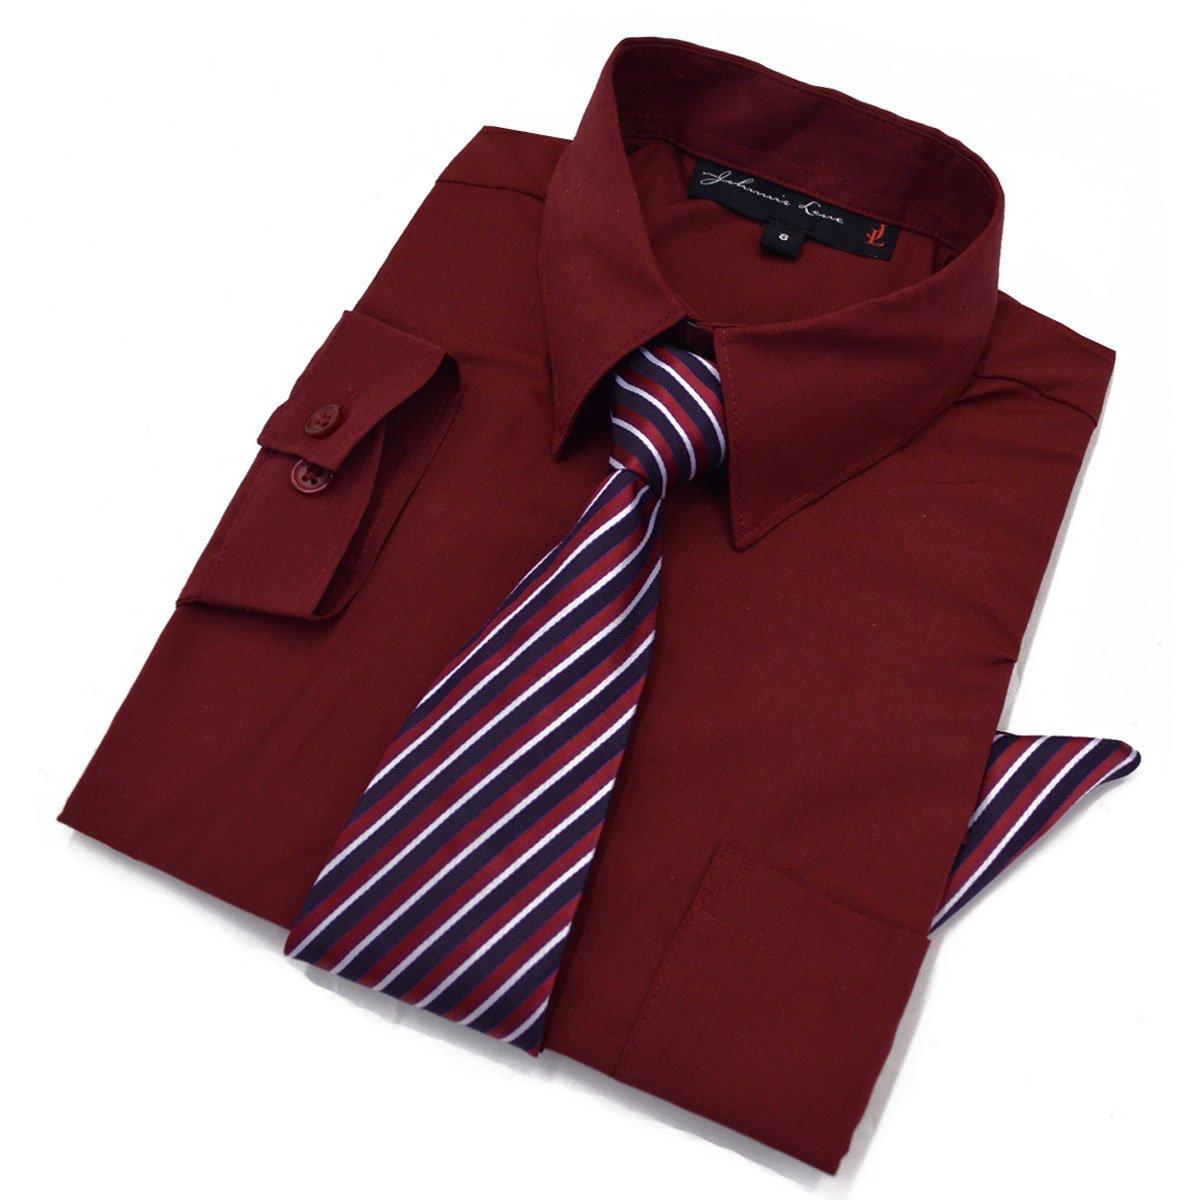 Big Boys Long Sleeve Dress Shirt with Tie and Handkerchief JL26 (8, Burgundy)